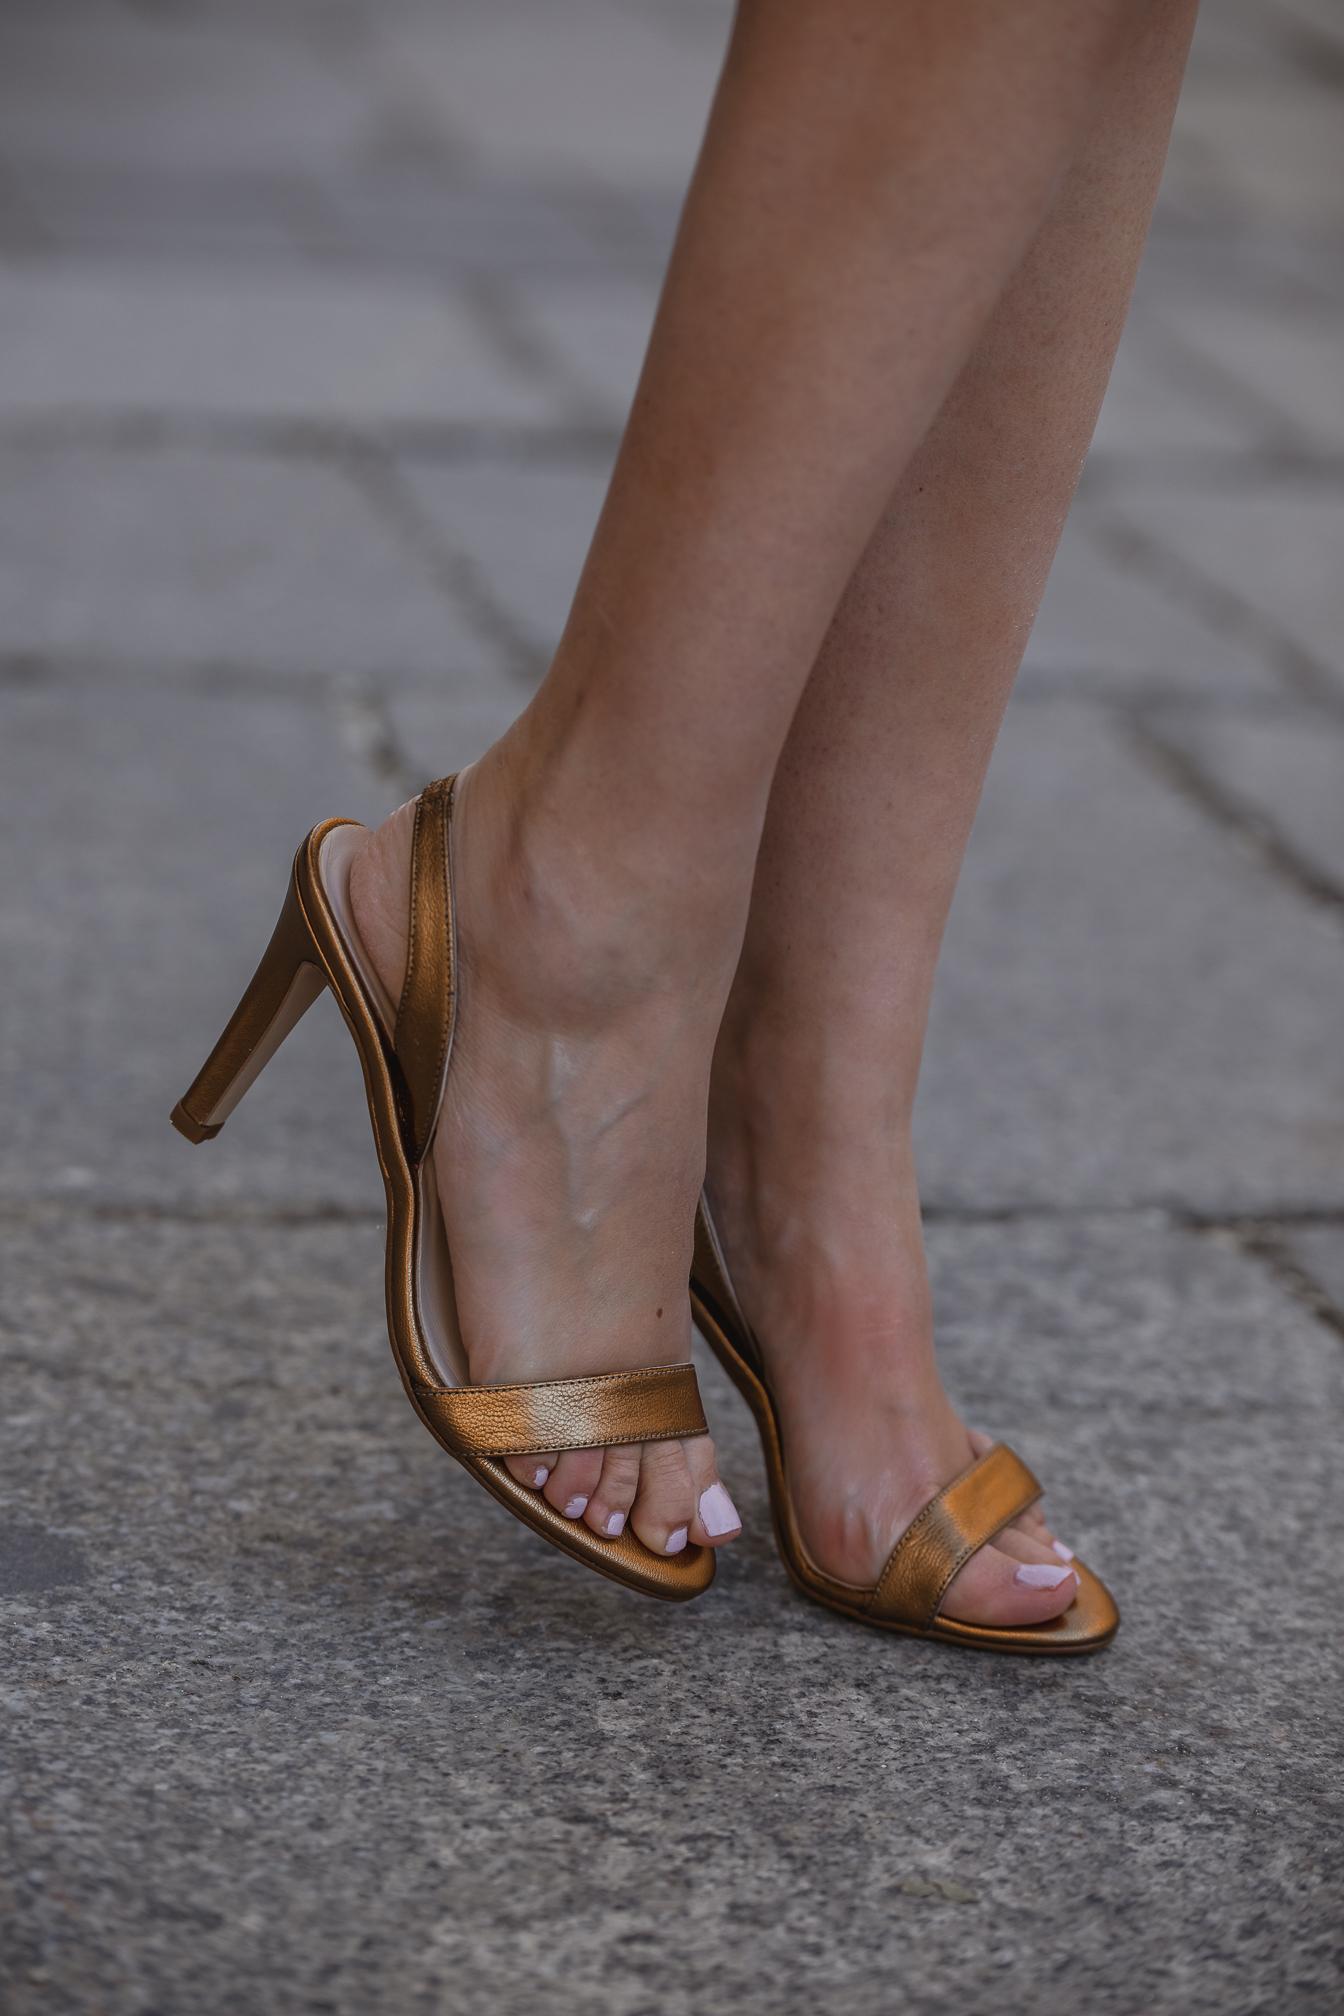 Sandalias doradas invitada